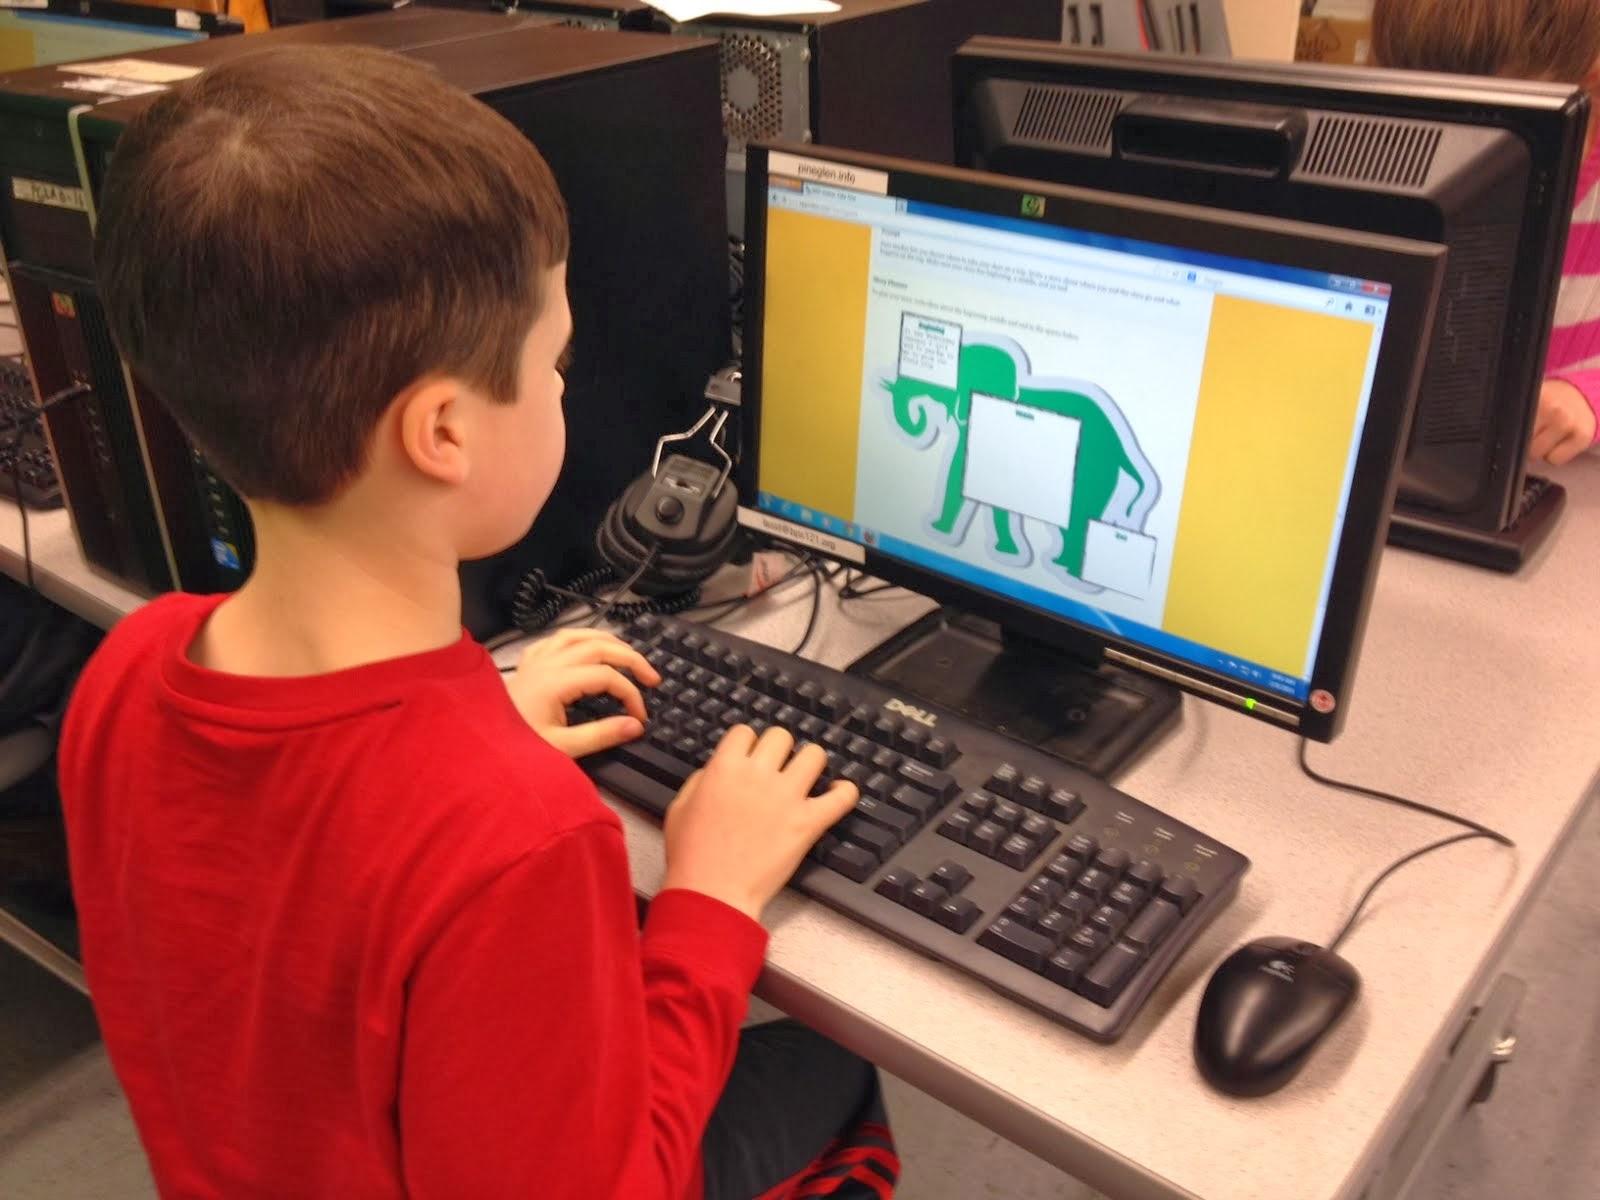 Pine Glen Elementary School Principal S Blog Computer Lab